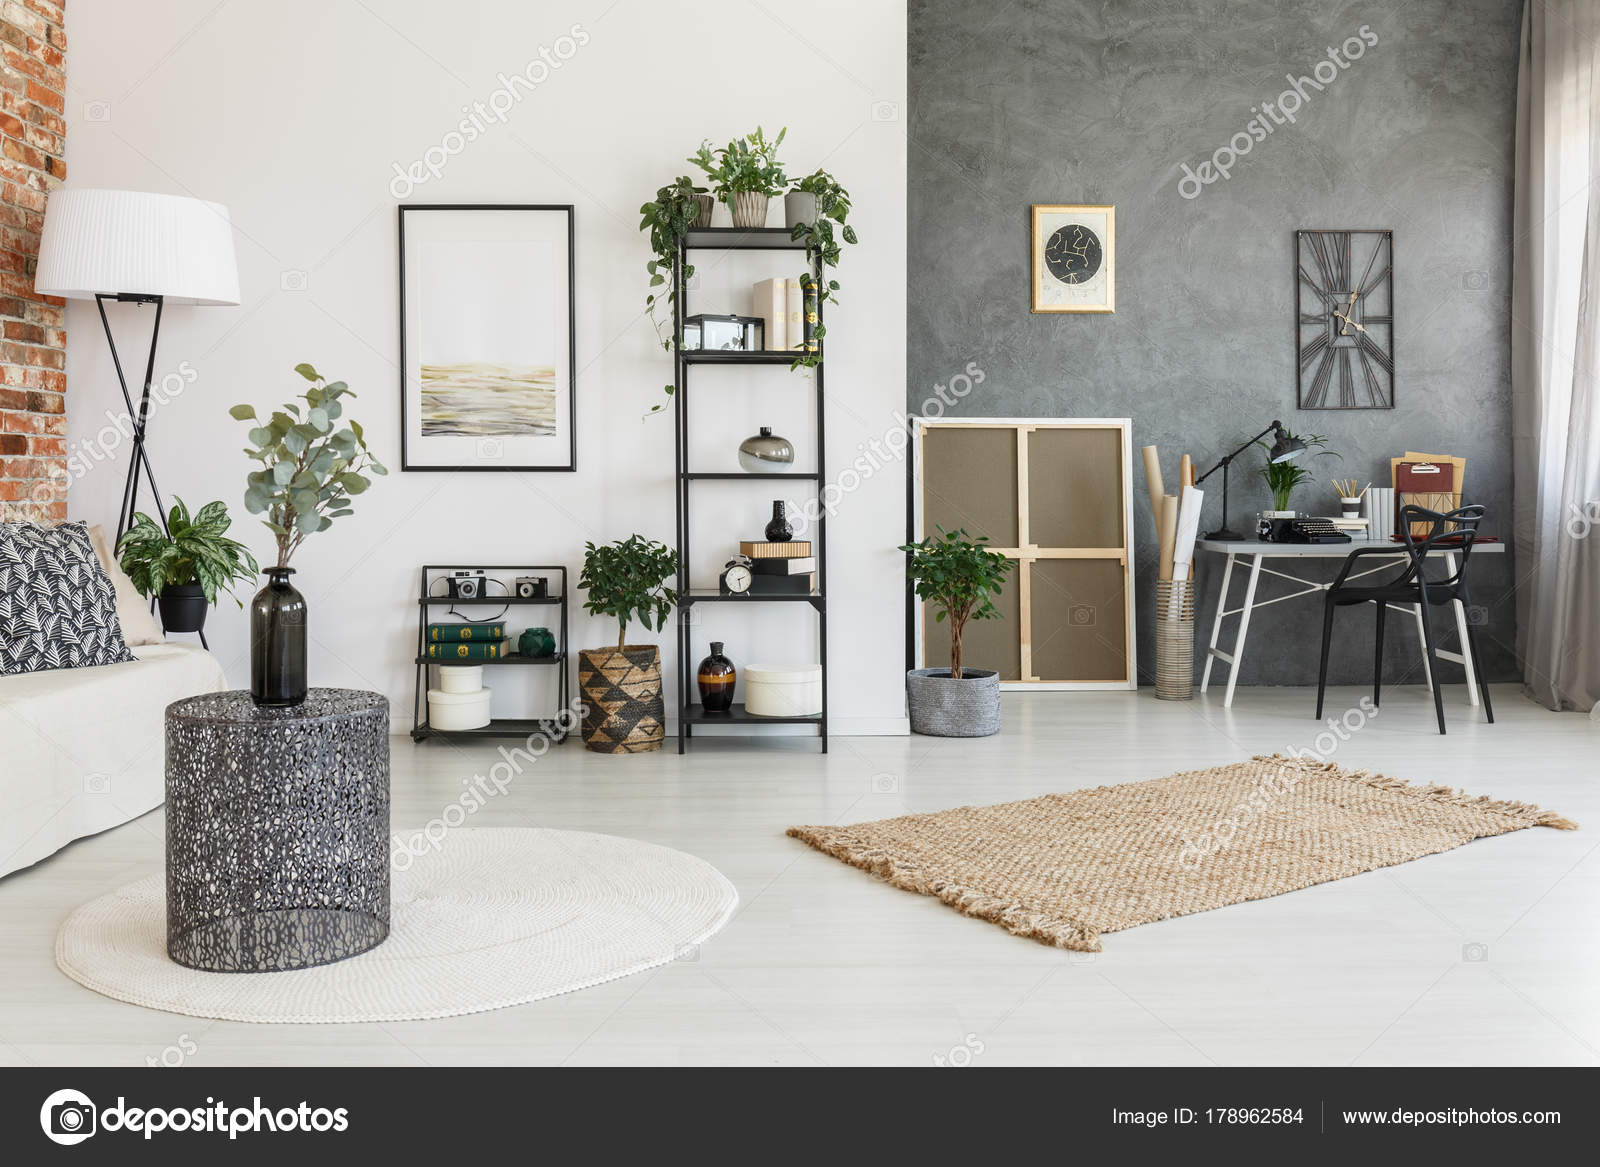 Planten In Woonkamer : Planten in woonkamer hf belbin